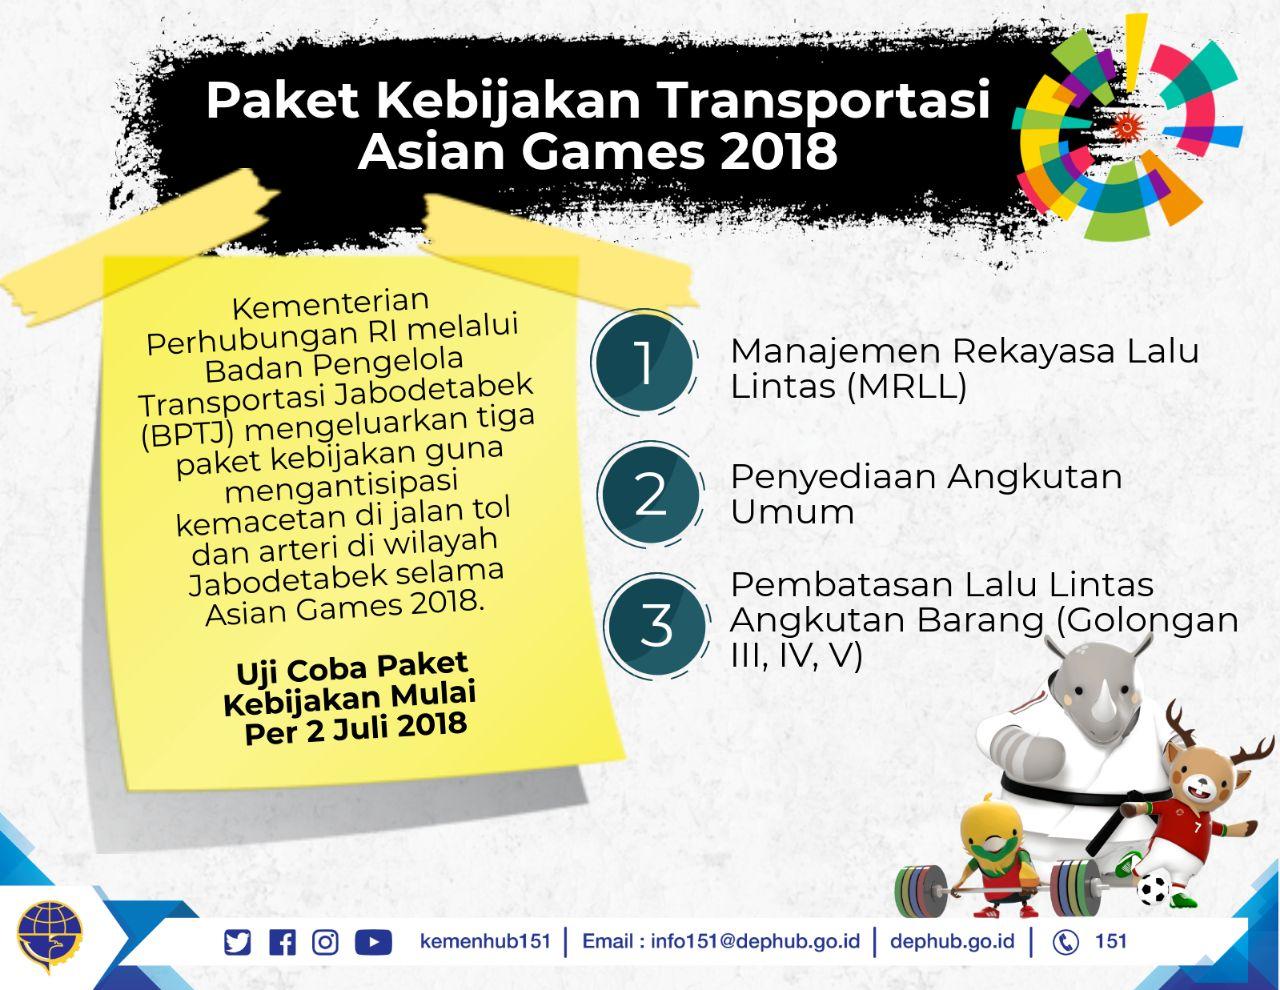 PAKET KEBIJAKAN TRANSPORTASI ASIAN GAMES